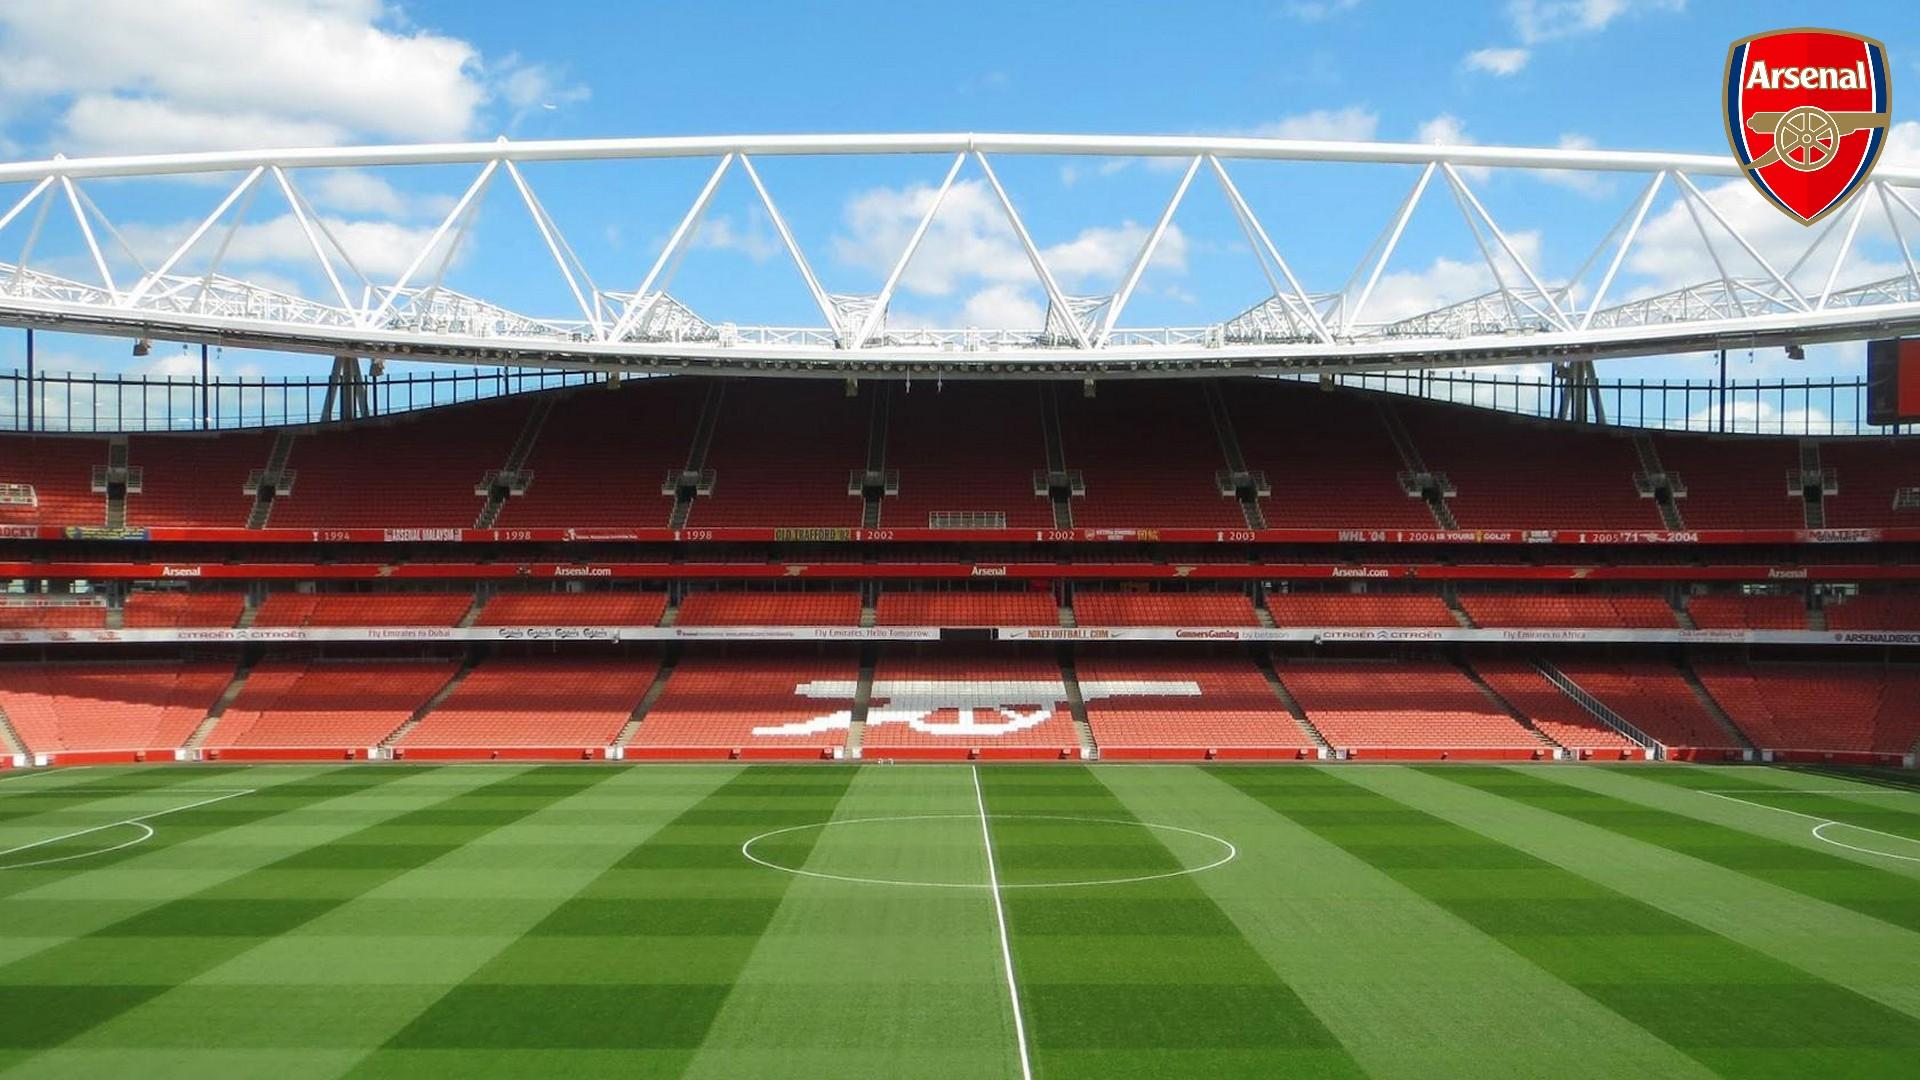 arsenal stadium mac backgrounds 2021